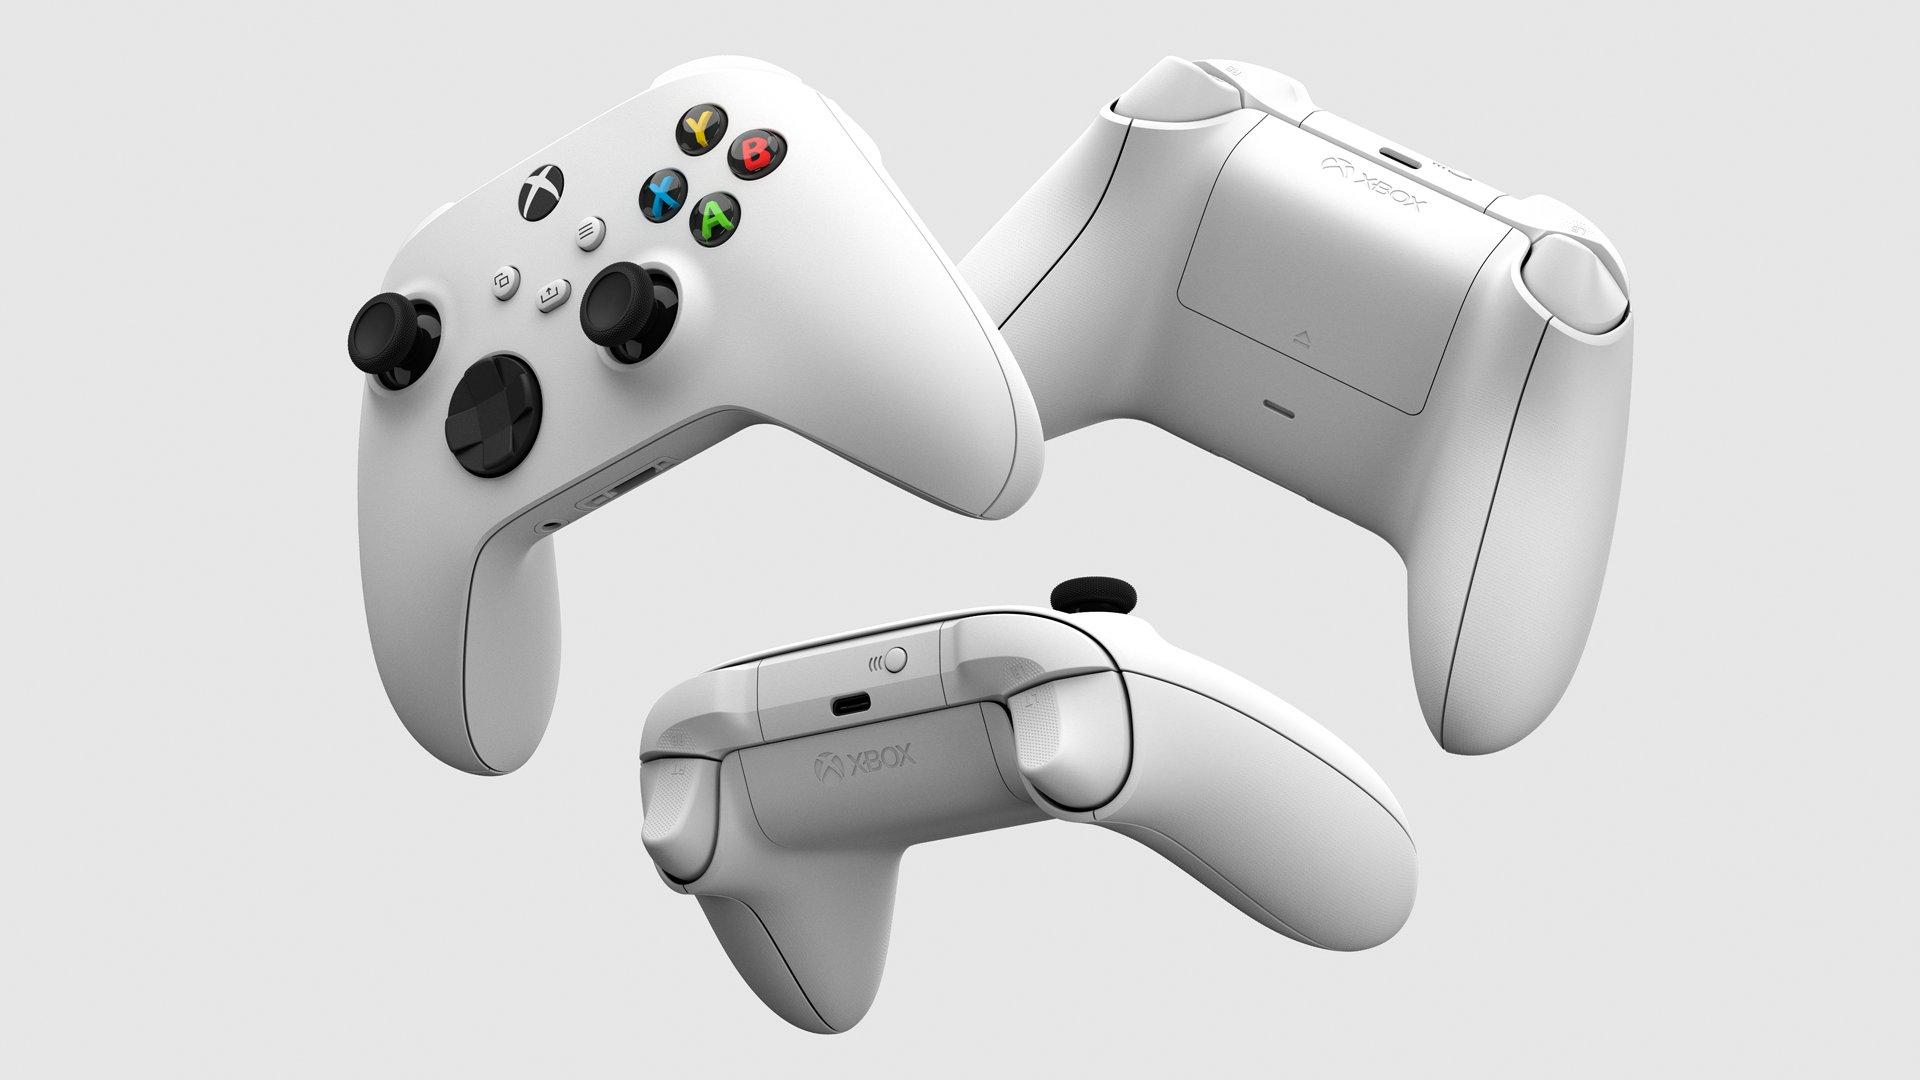 Как будет выглядеть геймпад Robot White от Xbox Series S